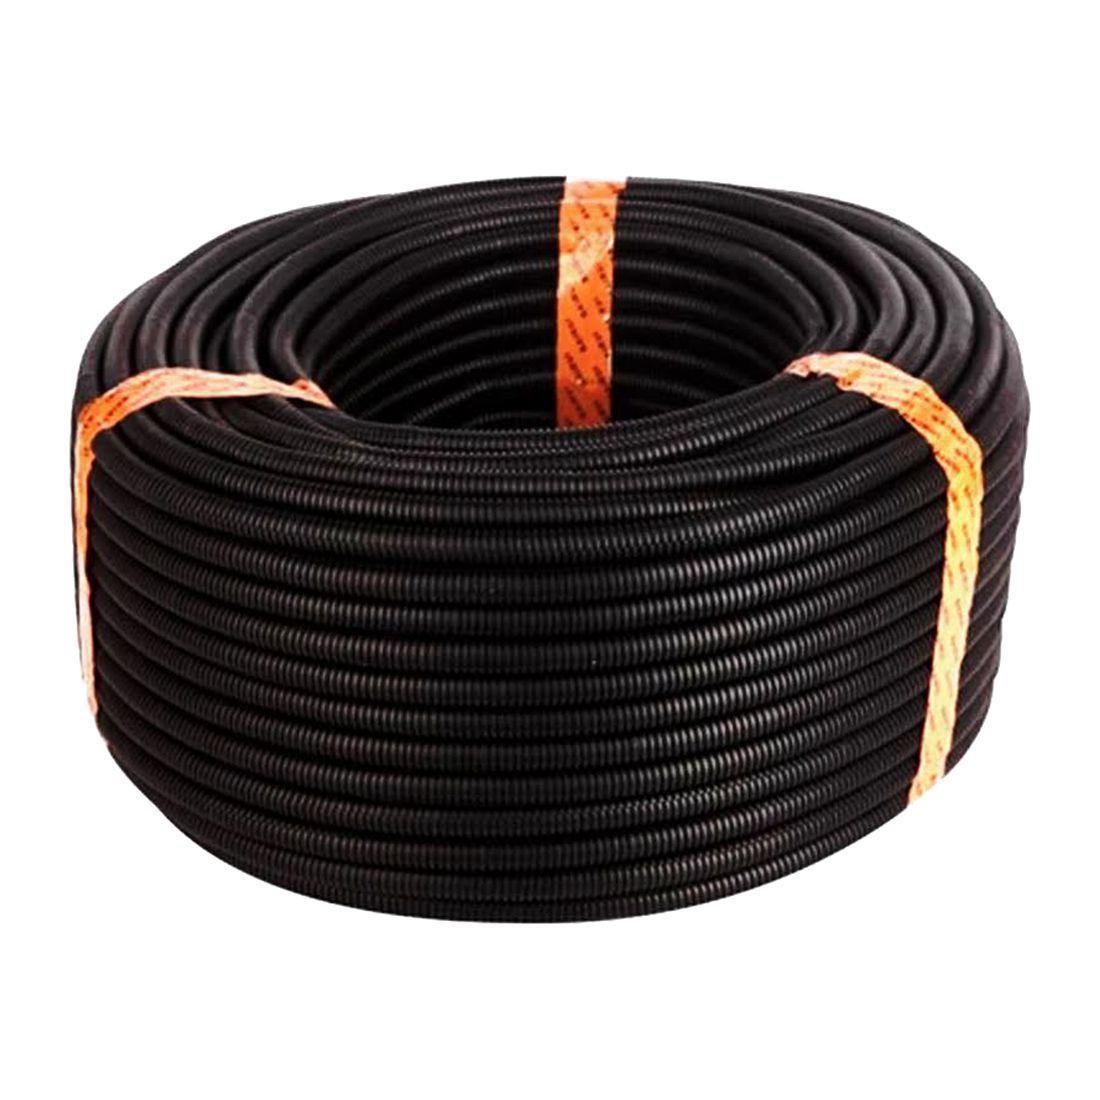 20 Ft 1 4 Inch Split Wire Loom Conduit Polyethylene Tubing Black Color Sleeve Tube Yesterday S Price Us 2 99 2 68 Eur T Black Color Flexible Tubing Black